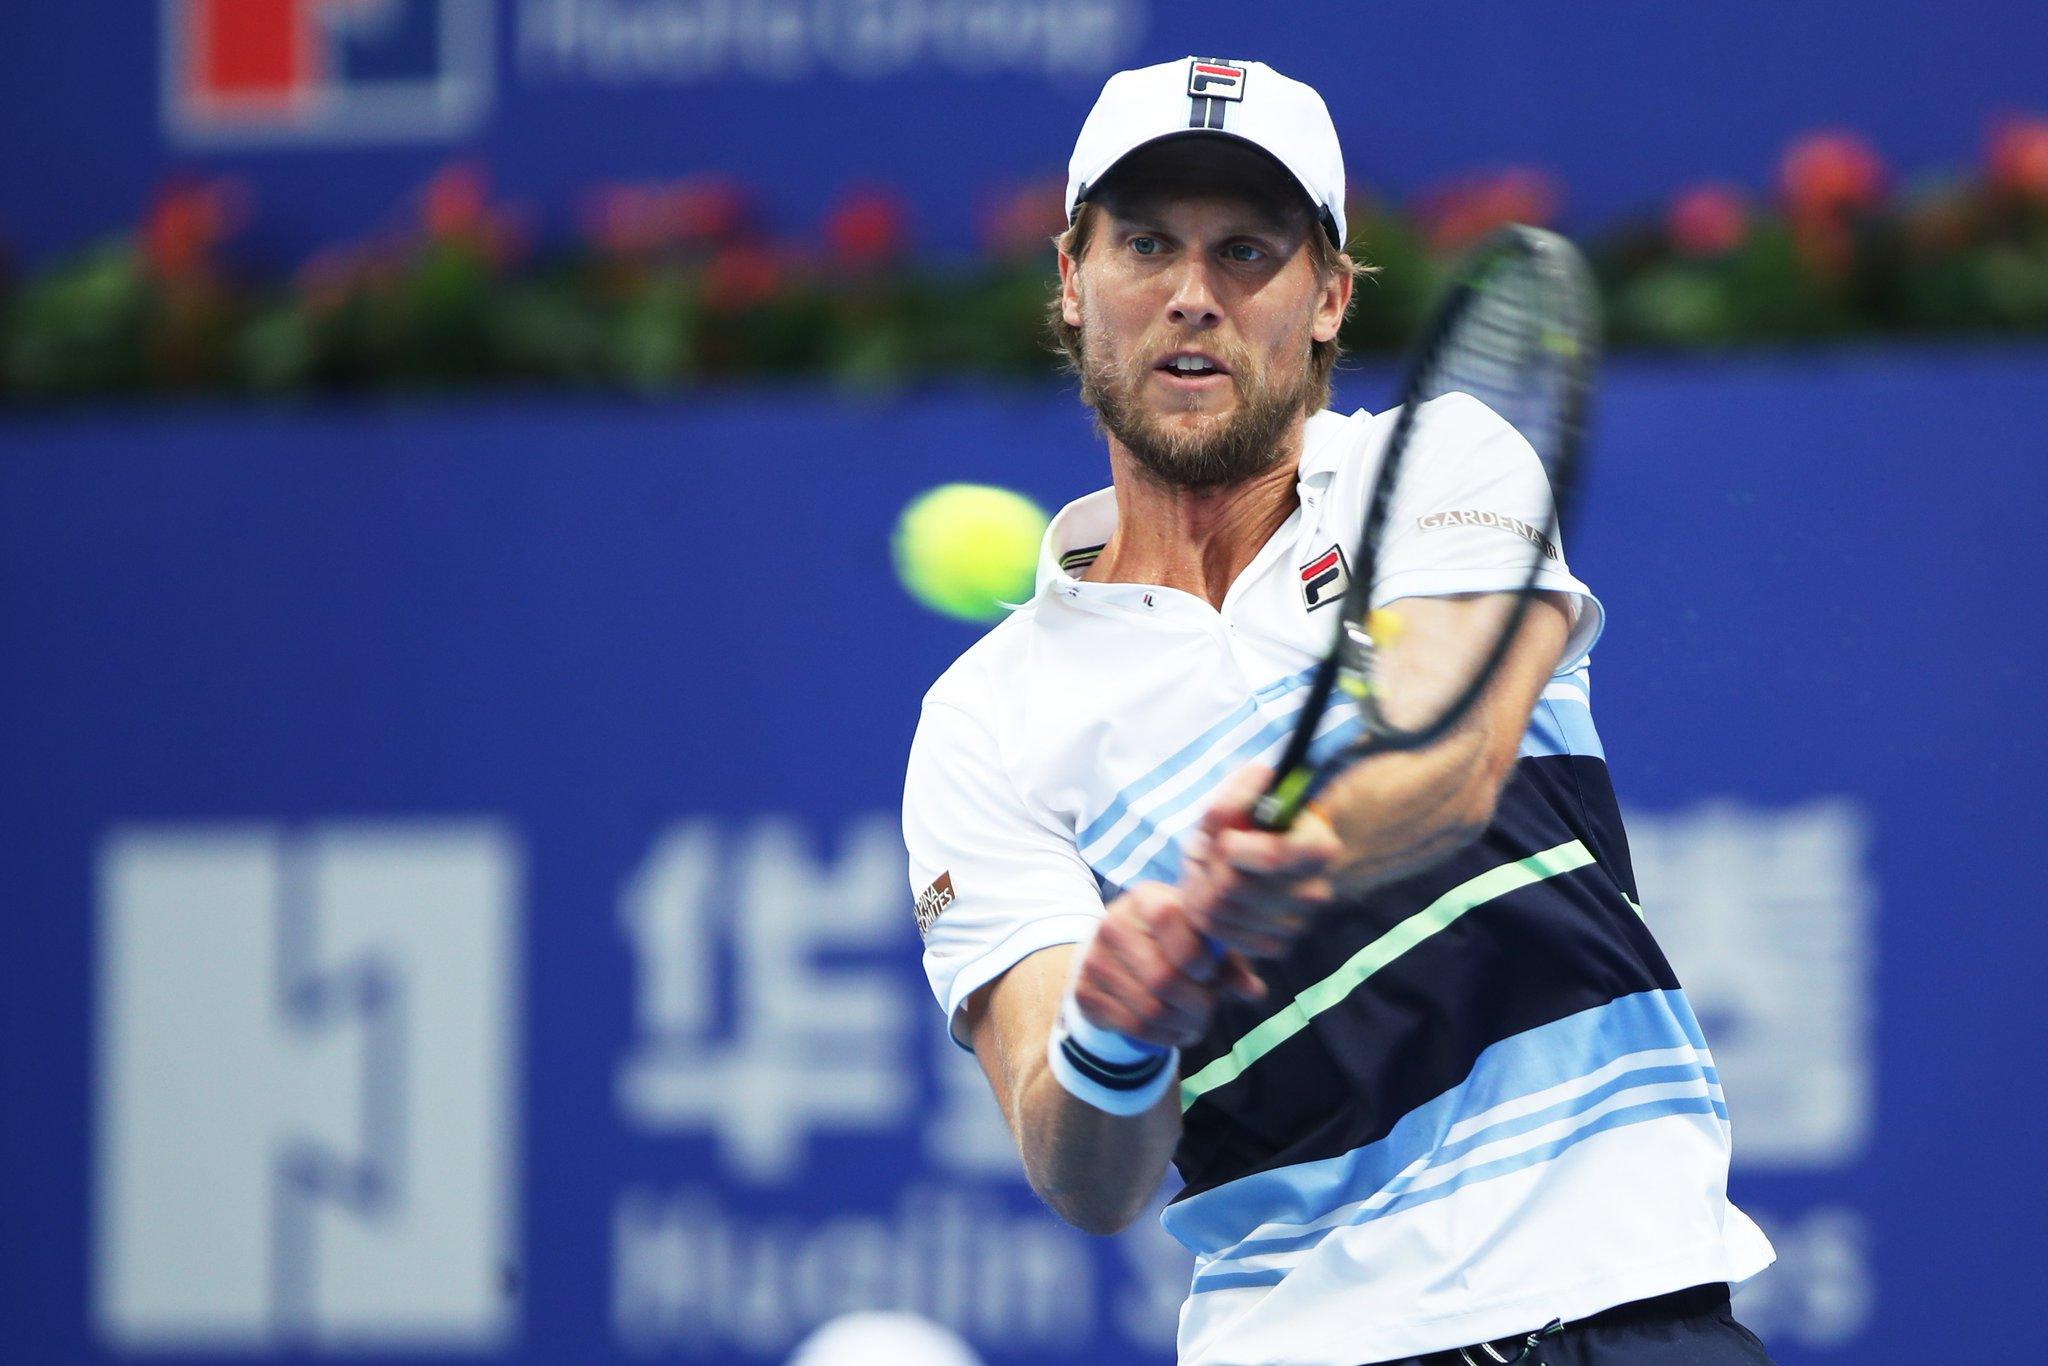 Australian Open: Sinner trifft auf Max Purcell